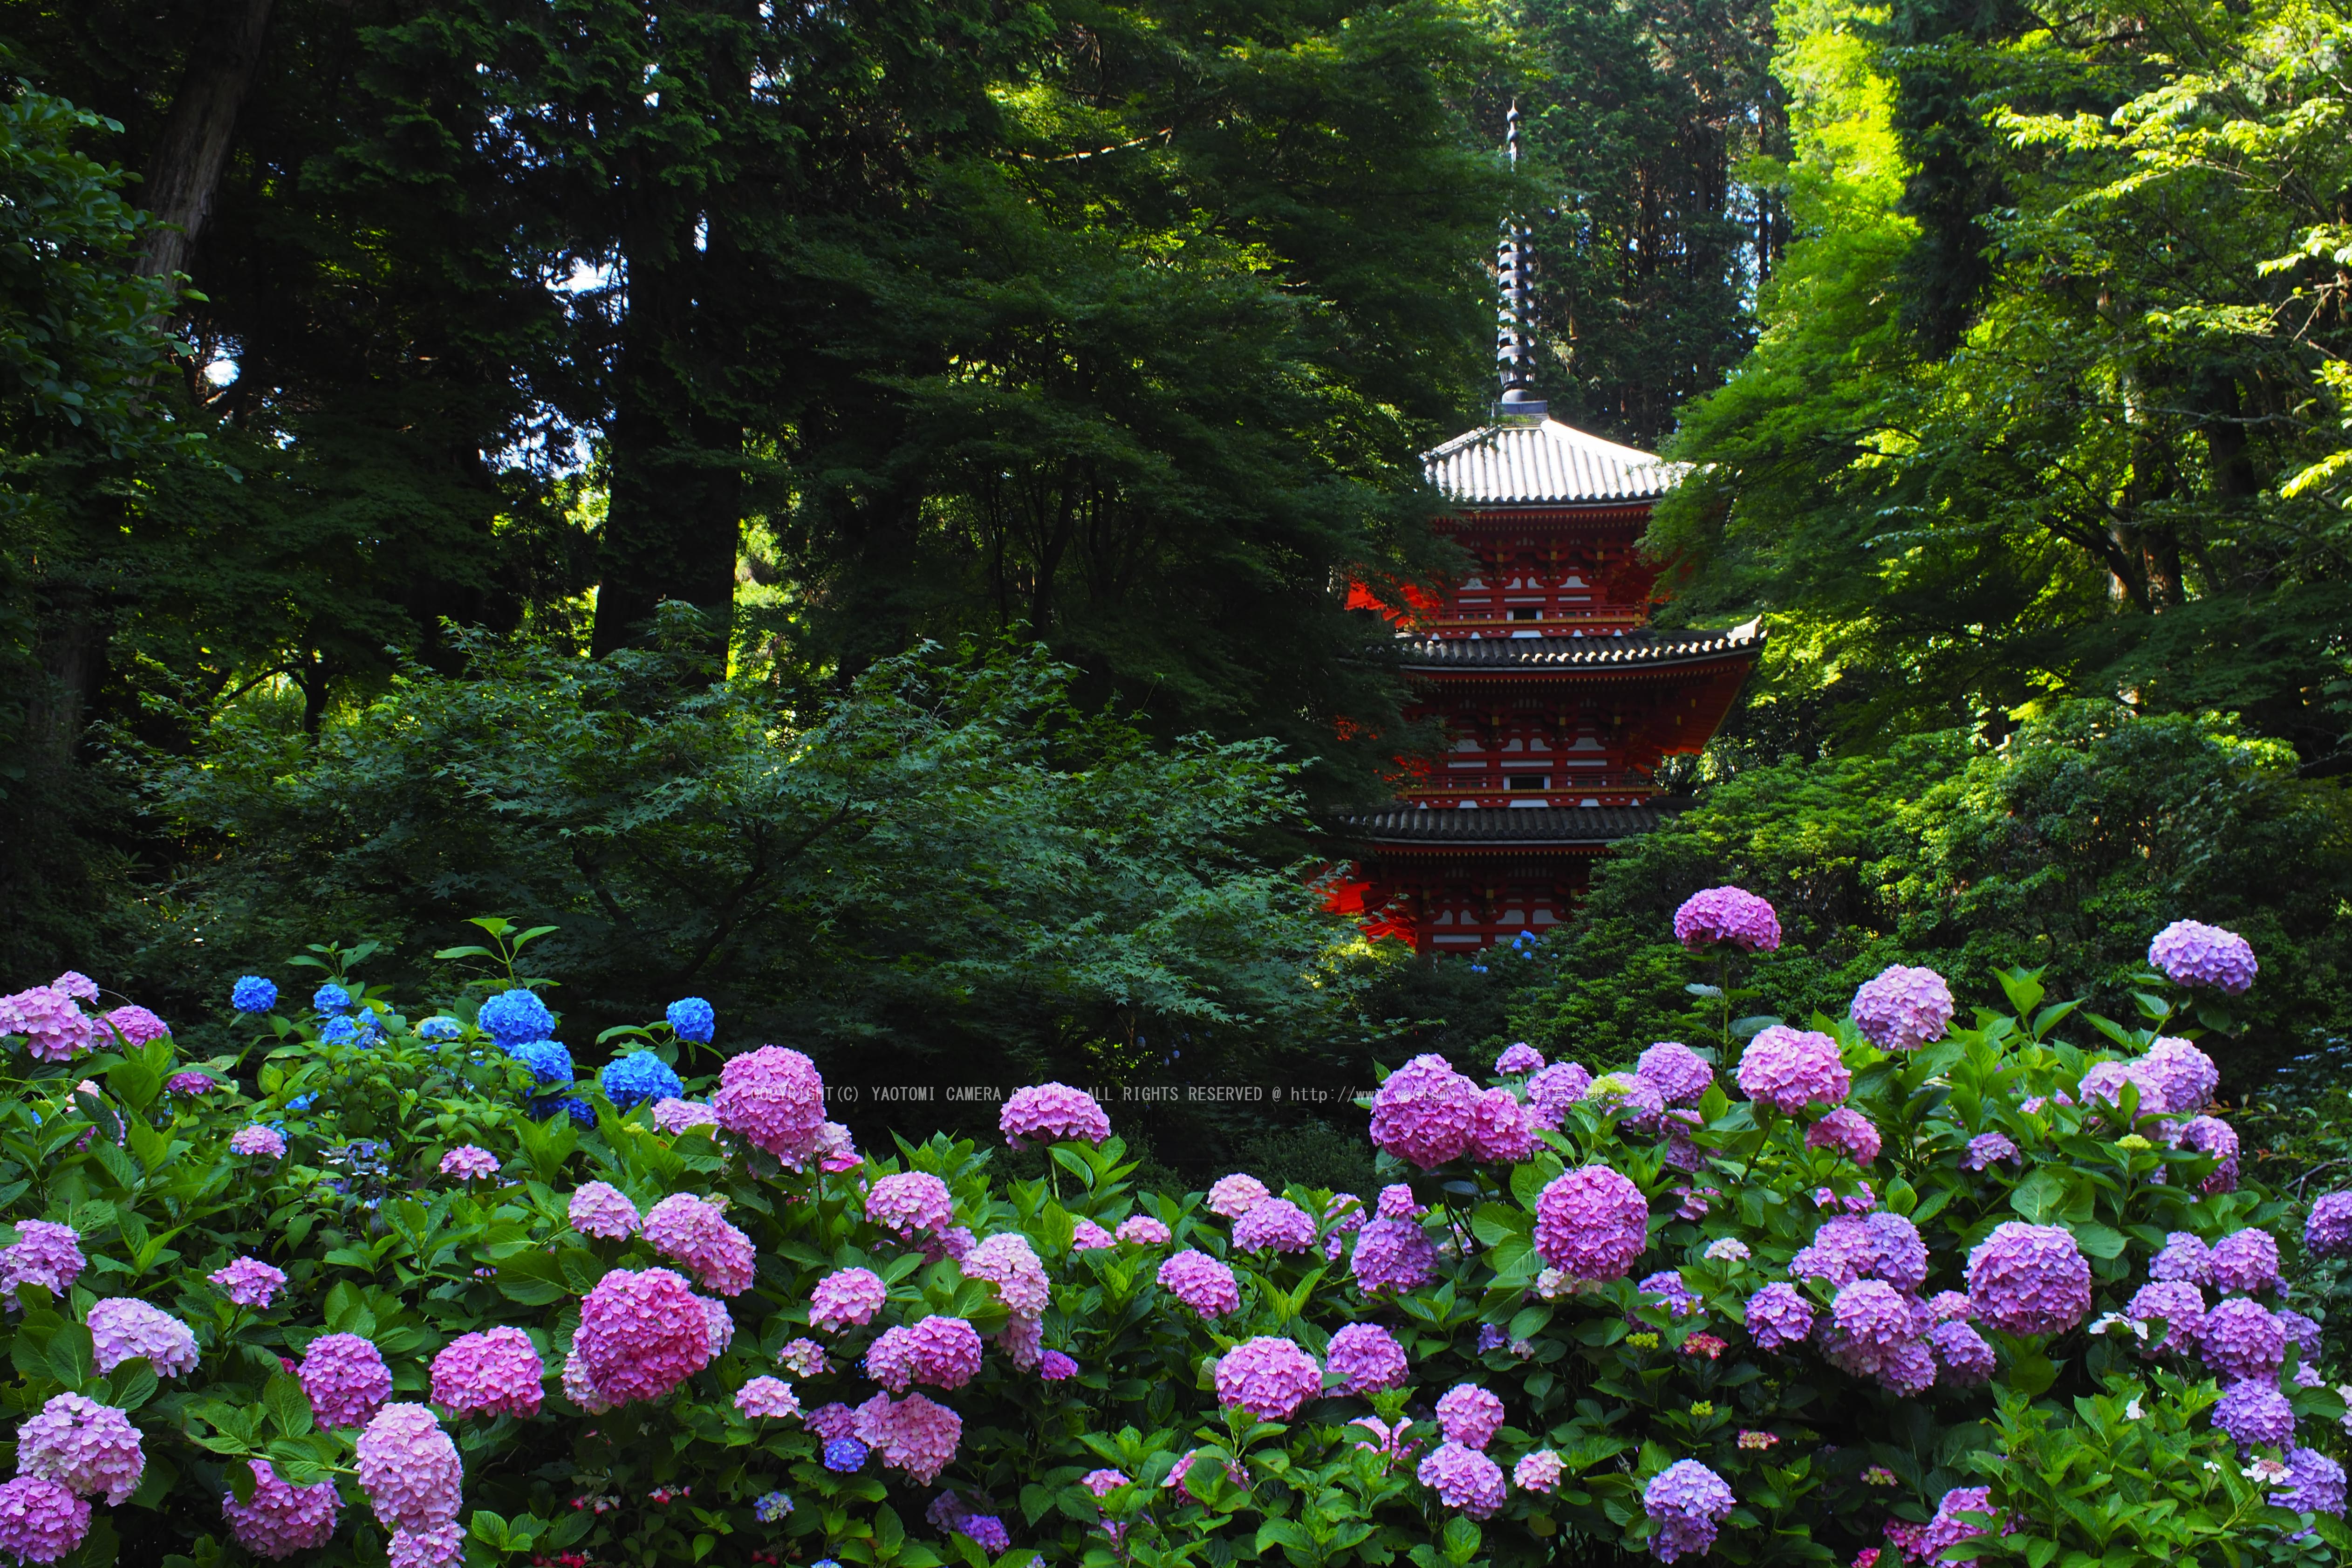 http://www.yaotomi.co.jp/blog/walk/%E5%B2%A9%E8%88%B9%E5%AF%BA%2C%E3%82%A2%E3%82%B8%E3%82%B5%E3%82%A4%28P6181838rawFL%2C18%20mm%2Ciso200%292016yaotomi.jpg